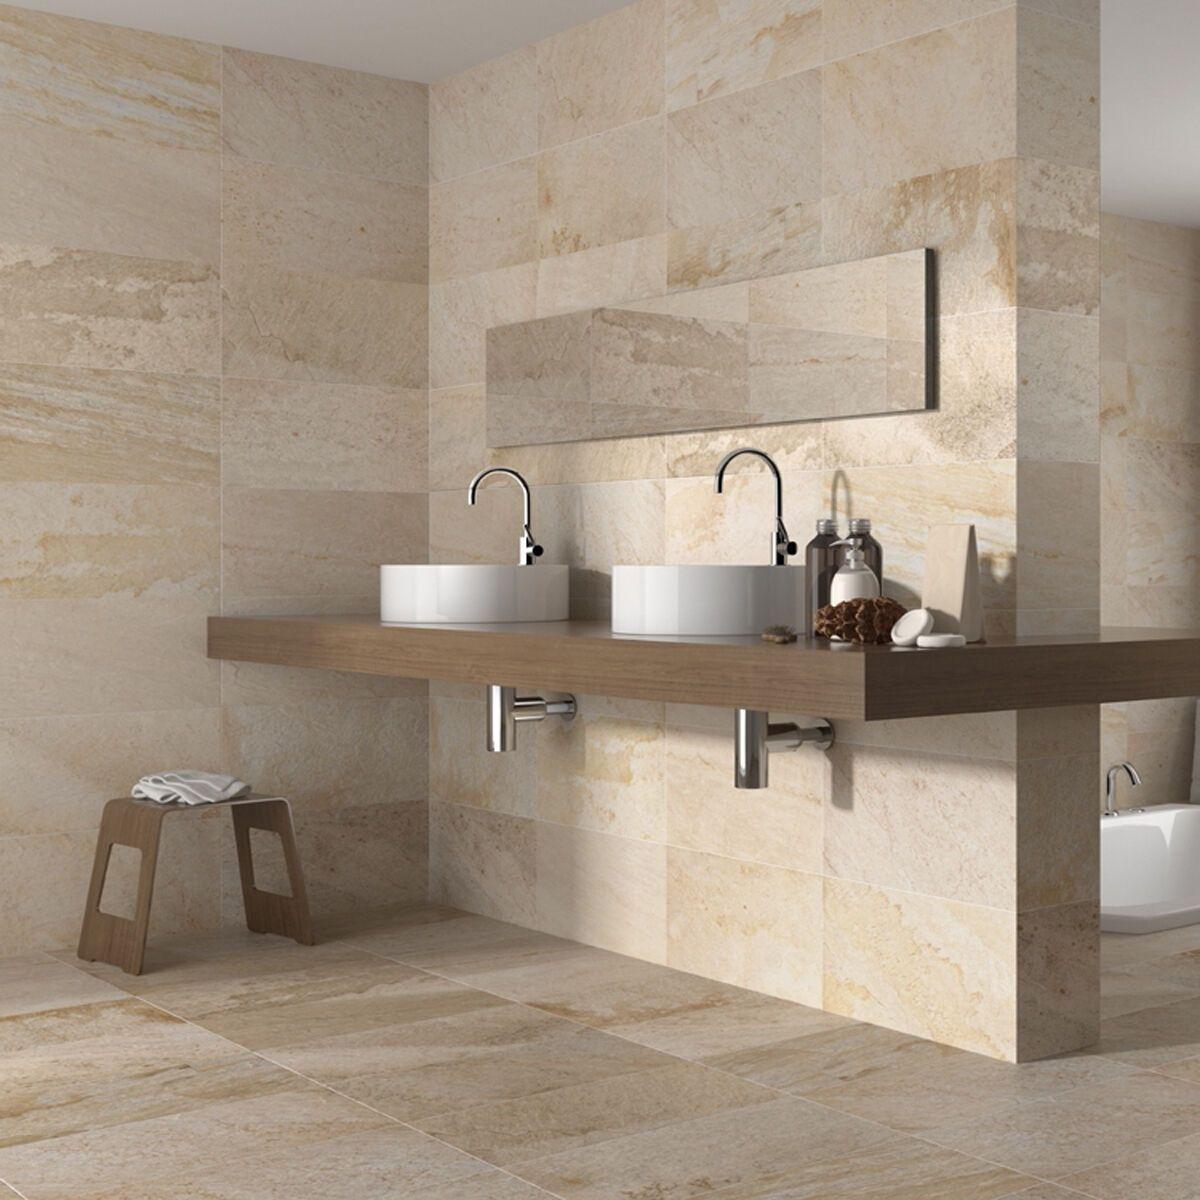 50x27 Matt Cream Stone Effect Ceramic Wall and Floor Tiles